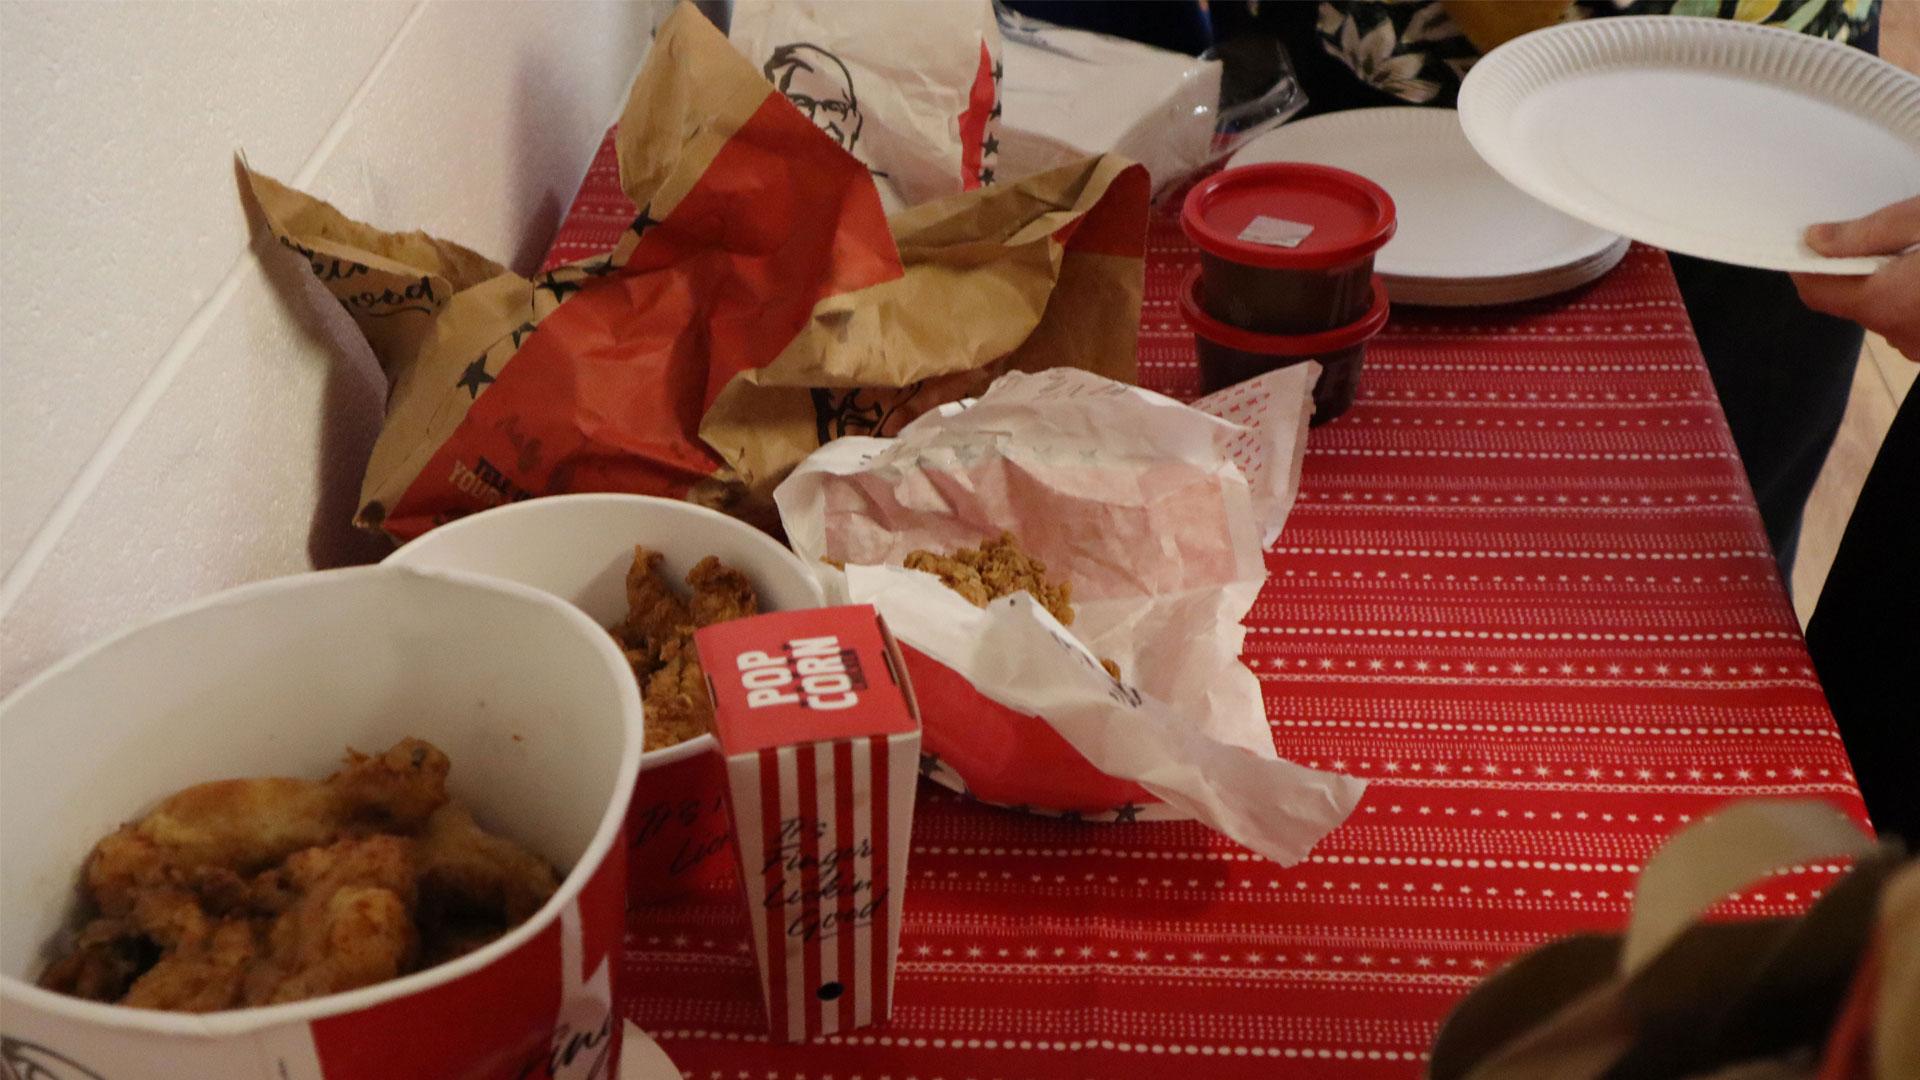 KFC-at-Leedsmoneyman